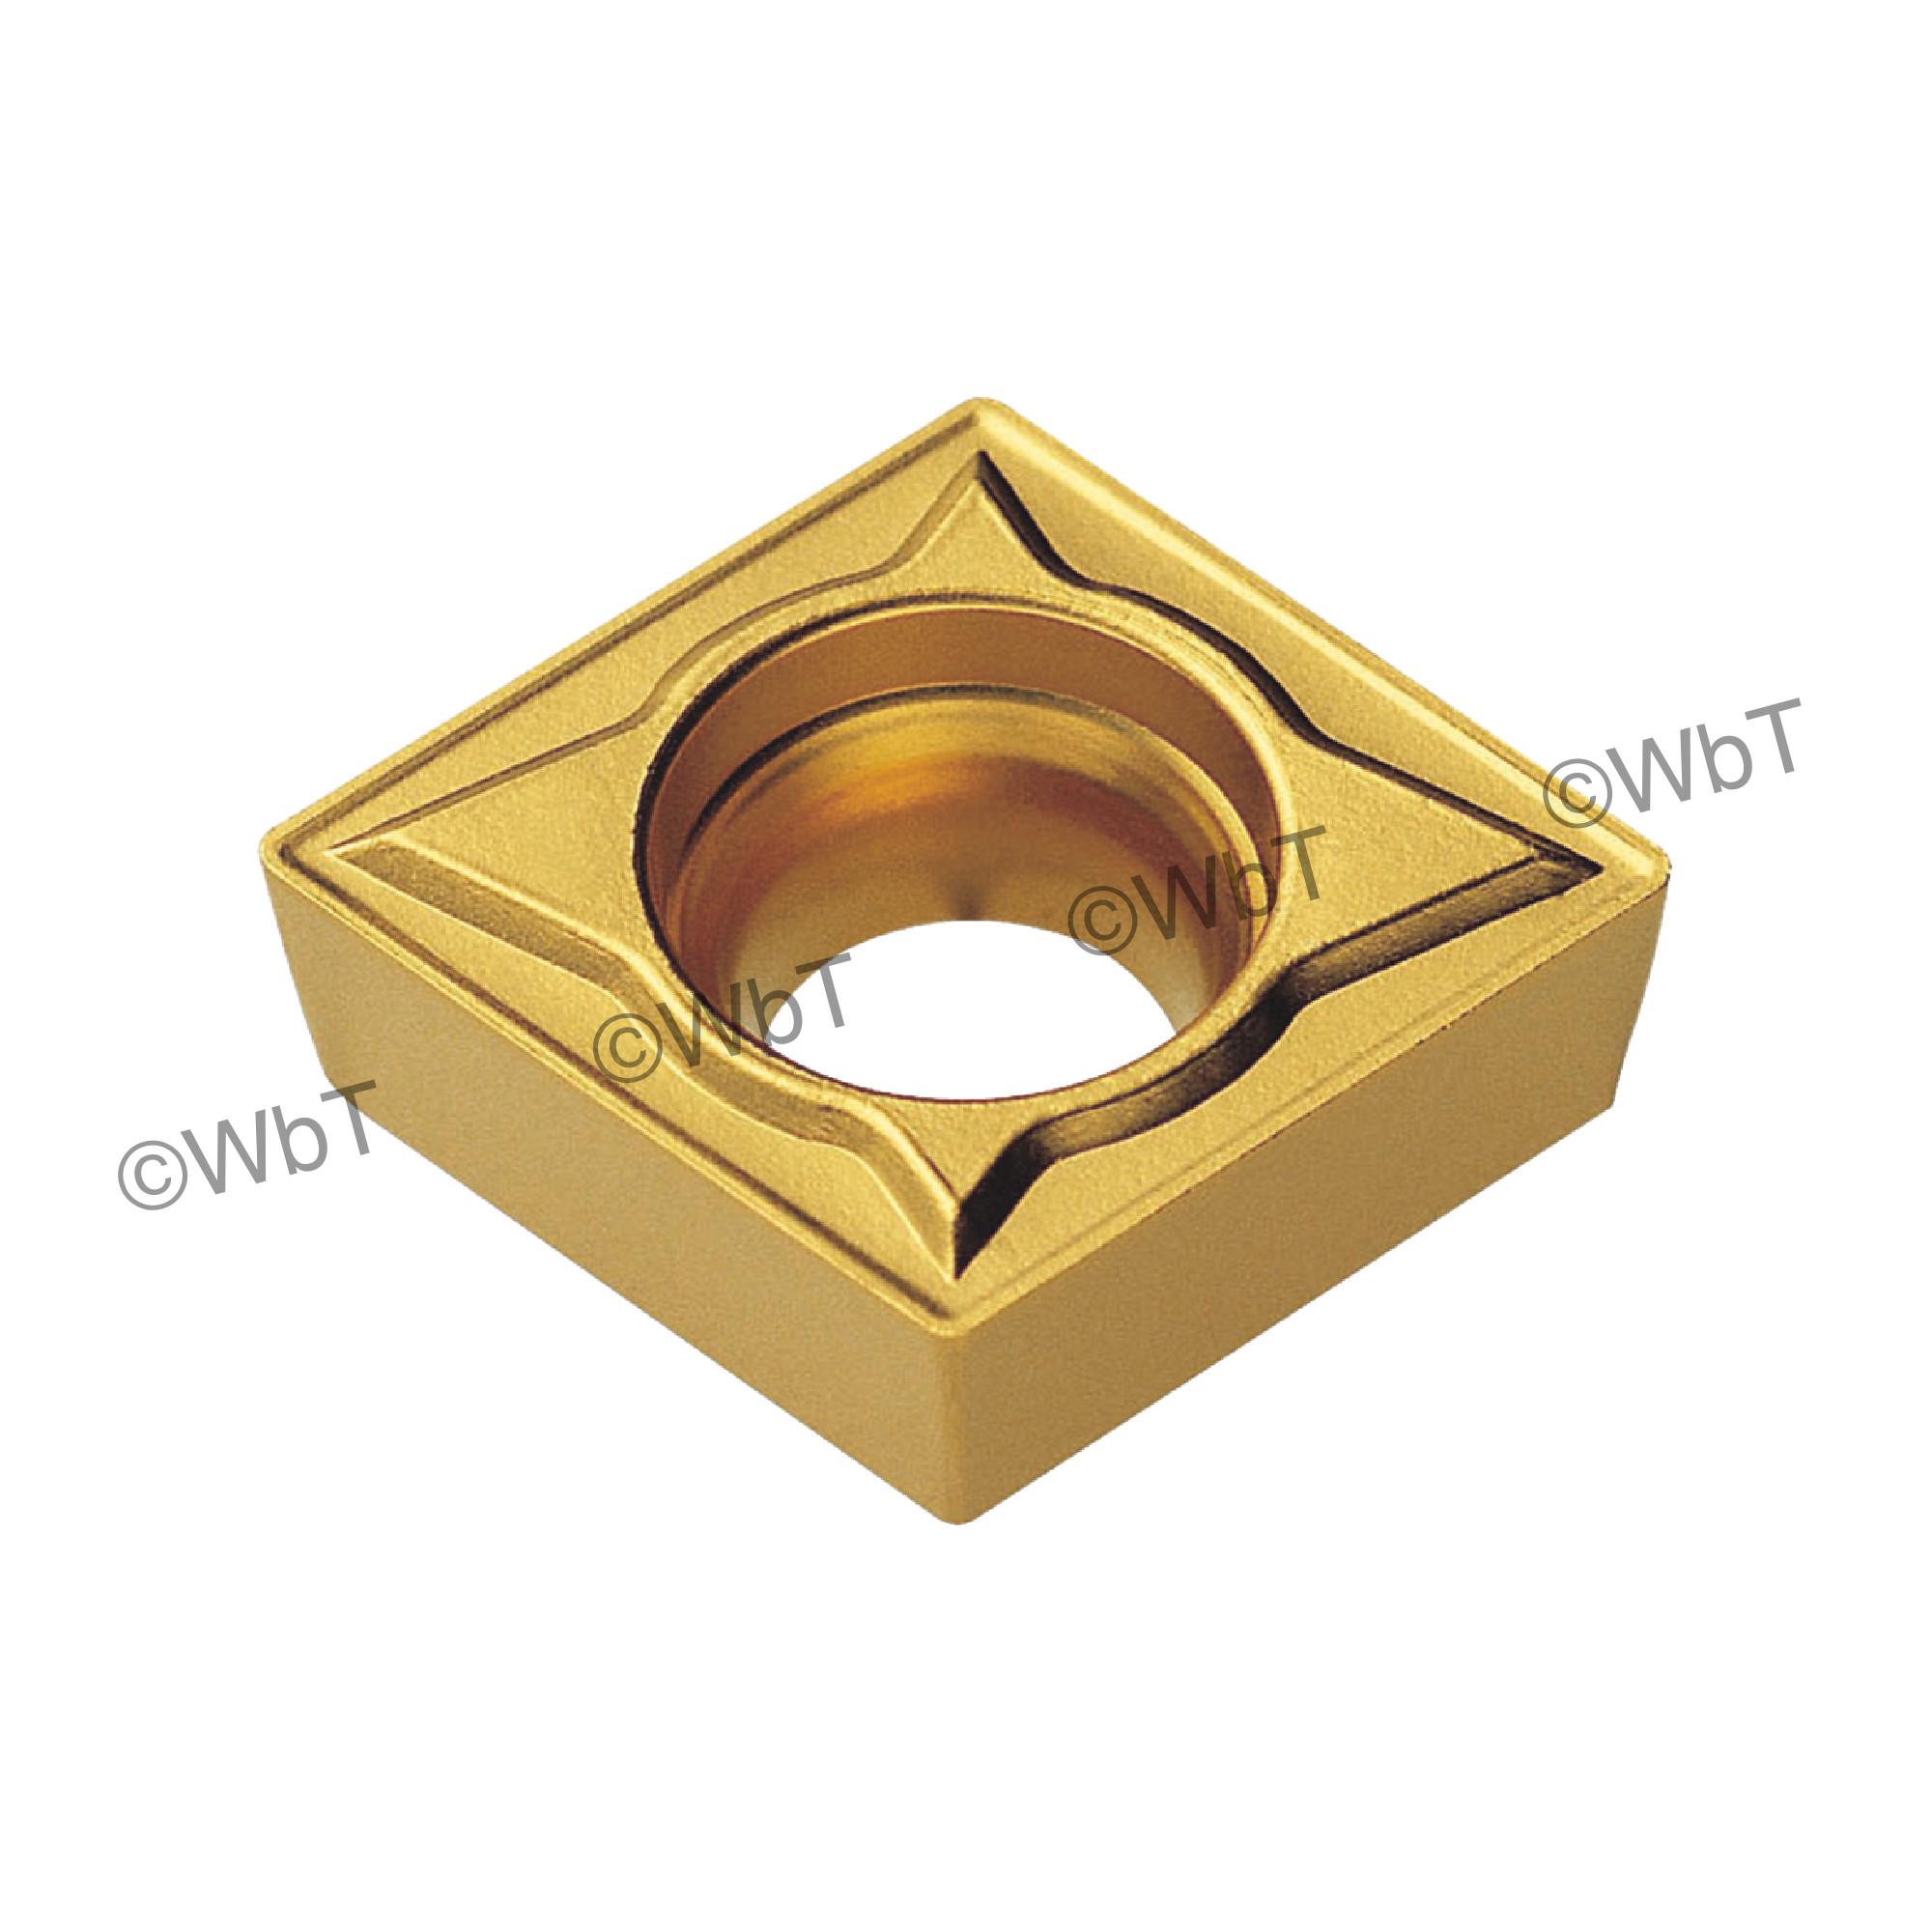 AKUMA - CCMT3(2.5)2-MP1 CT25M - 80° Diamond / Indexable Carbide Turning Insert